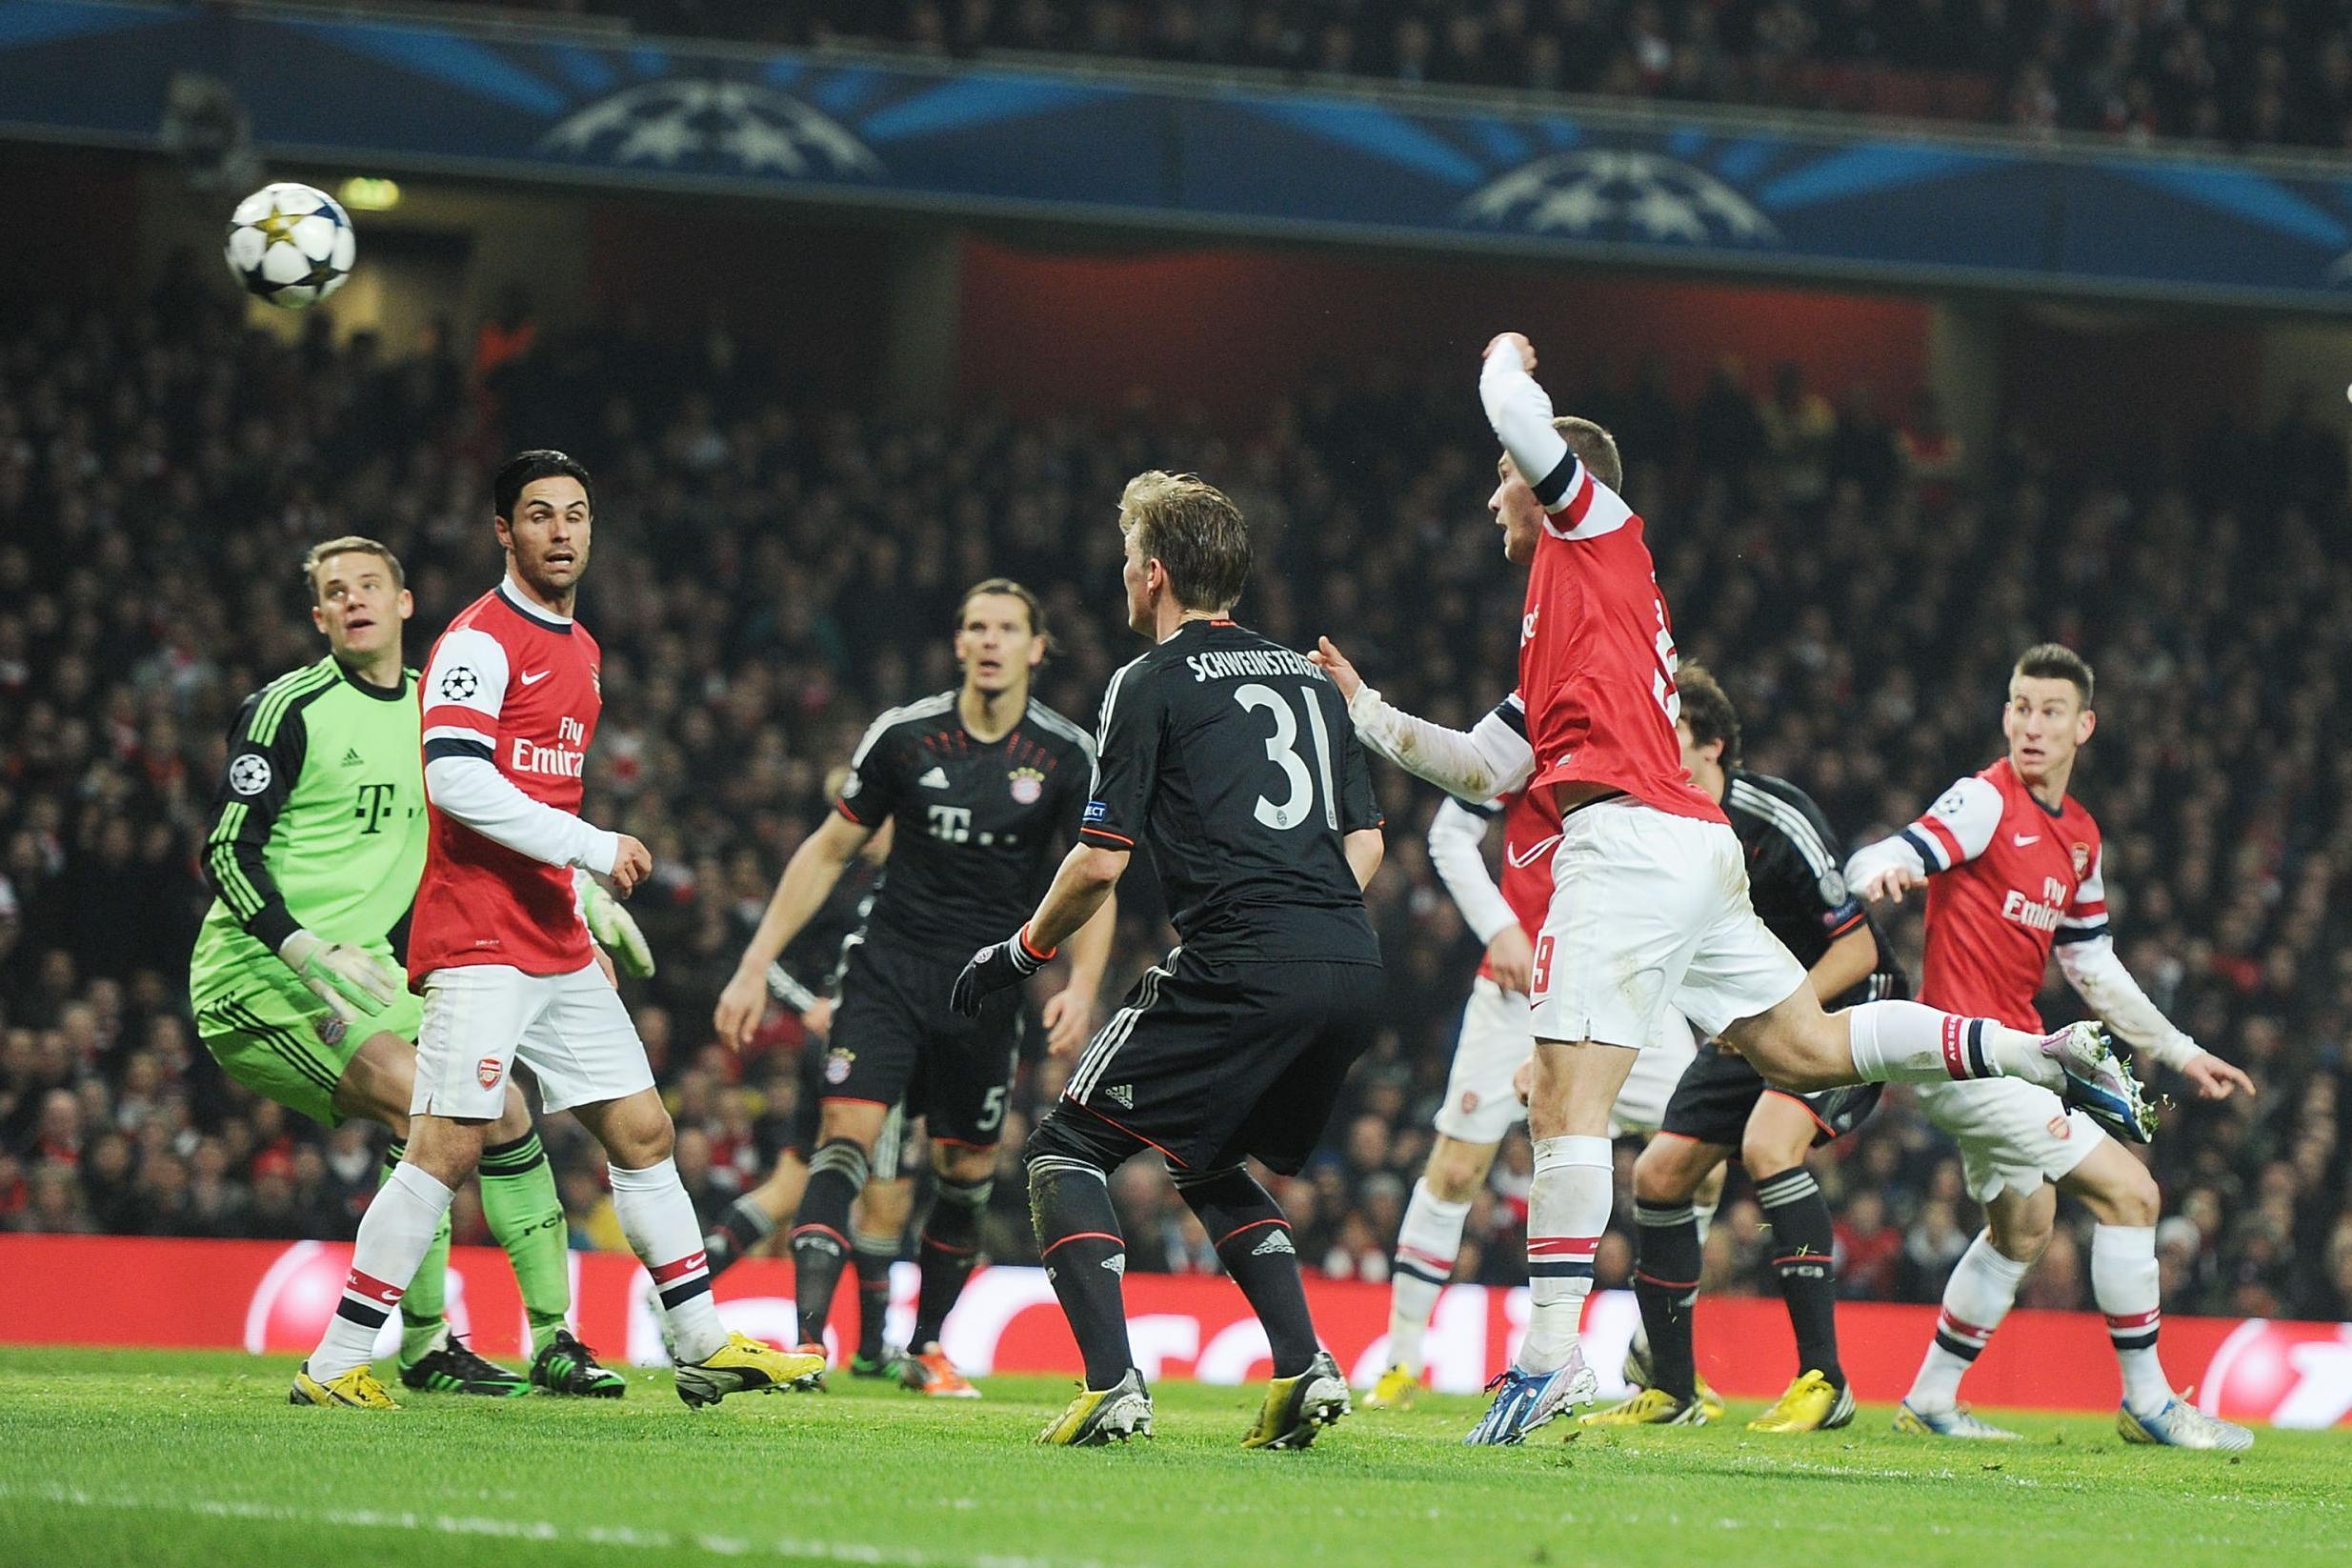 «Арсенал» и «Бавария» – классика Лиги чемпионов в 2010-х